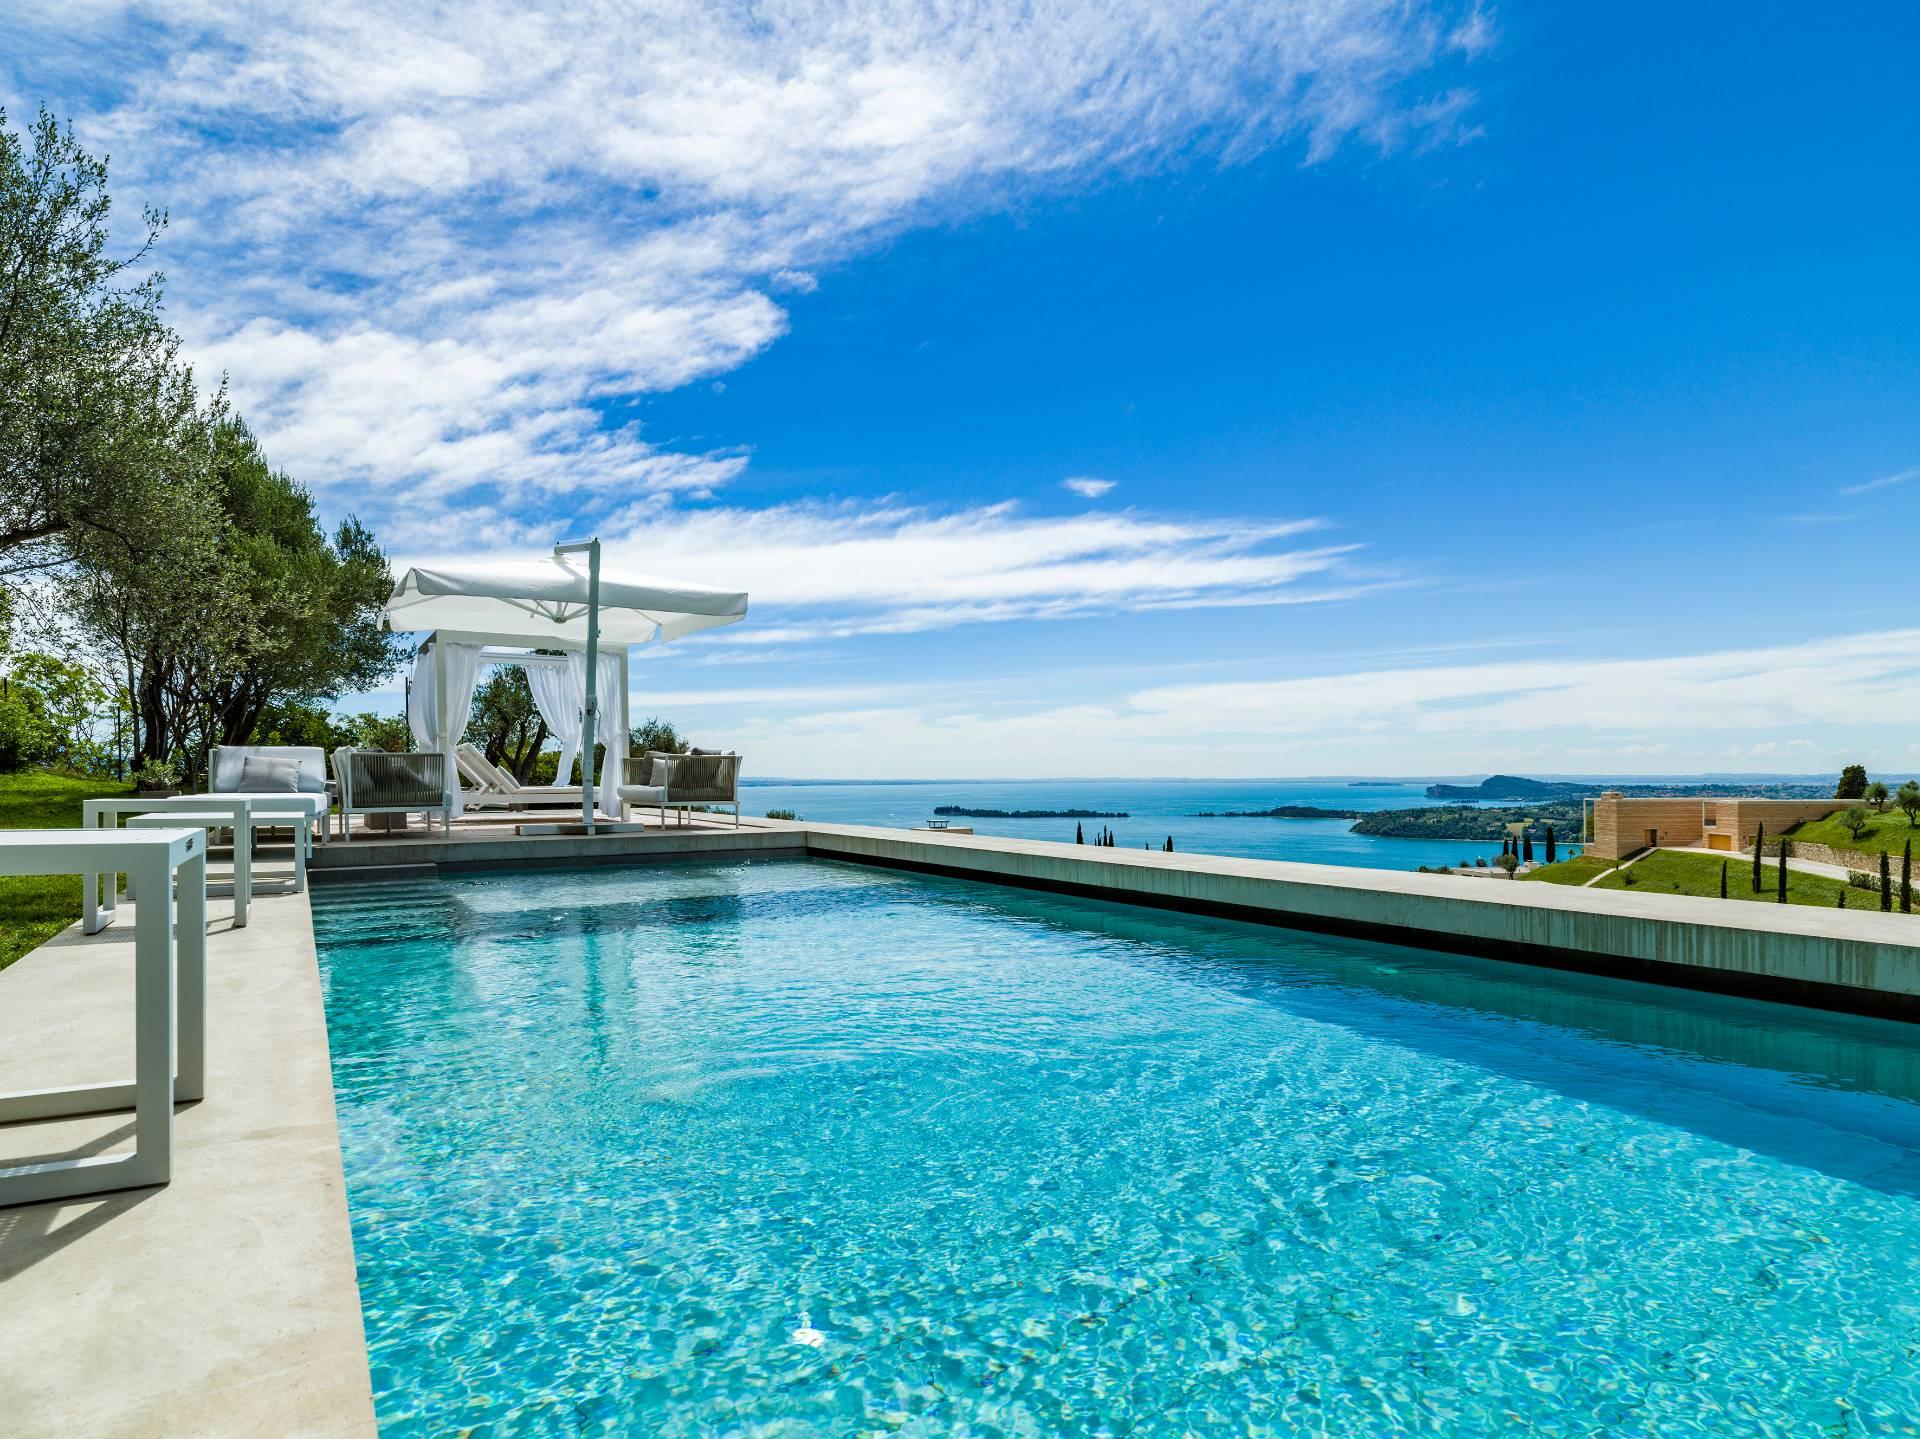 Residential complex to Gardone Riviera